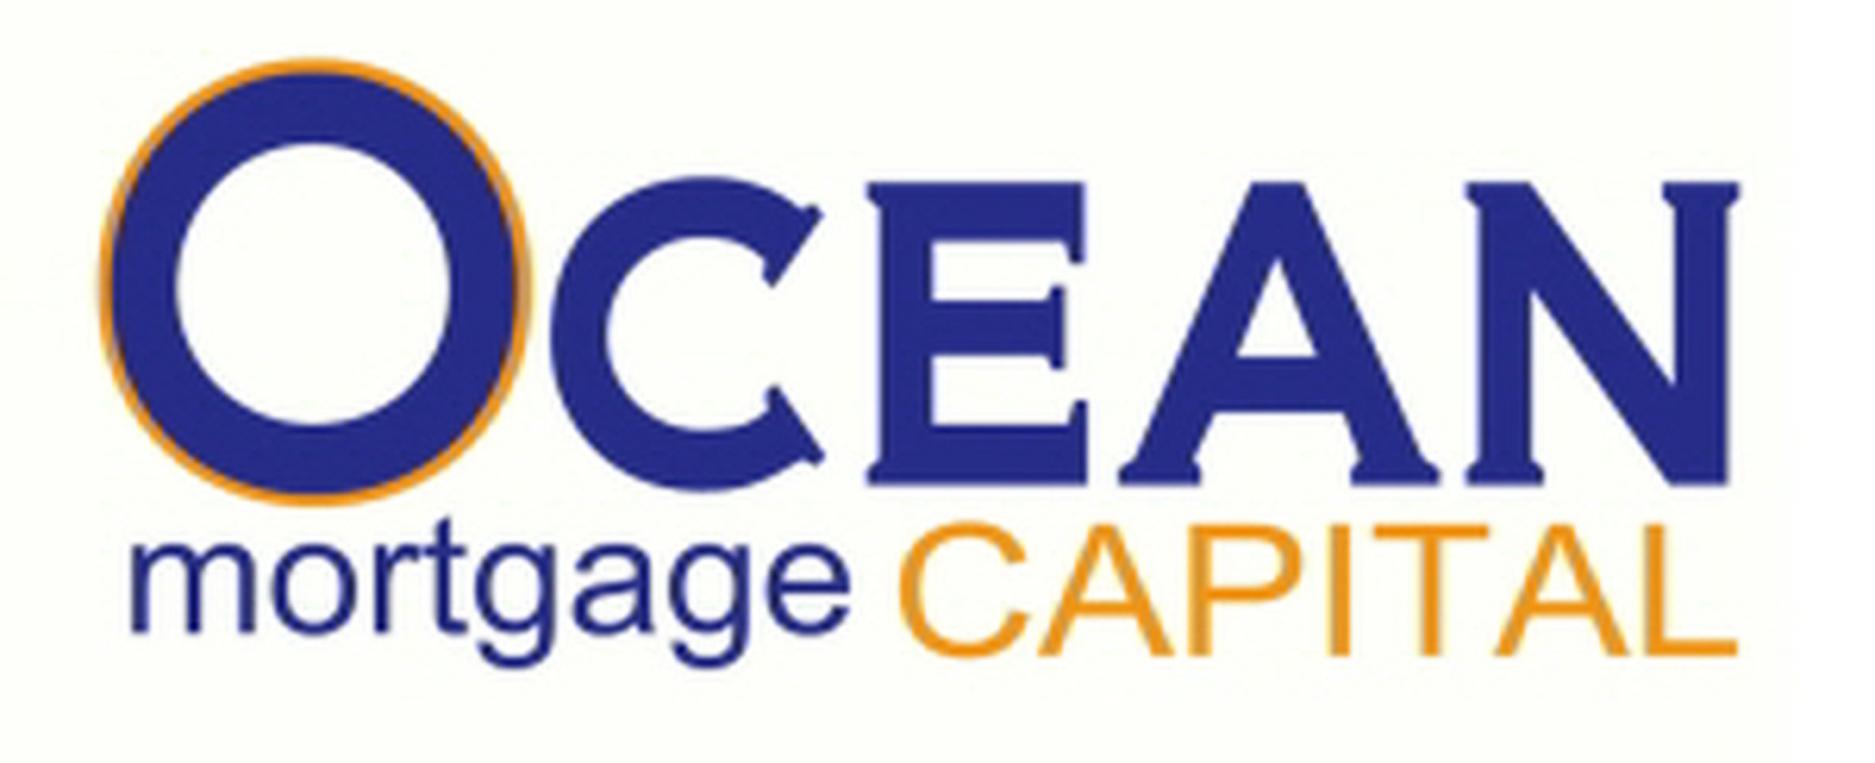 Ocean Mortgage Logo